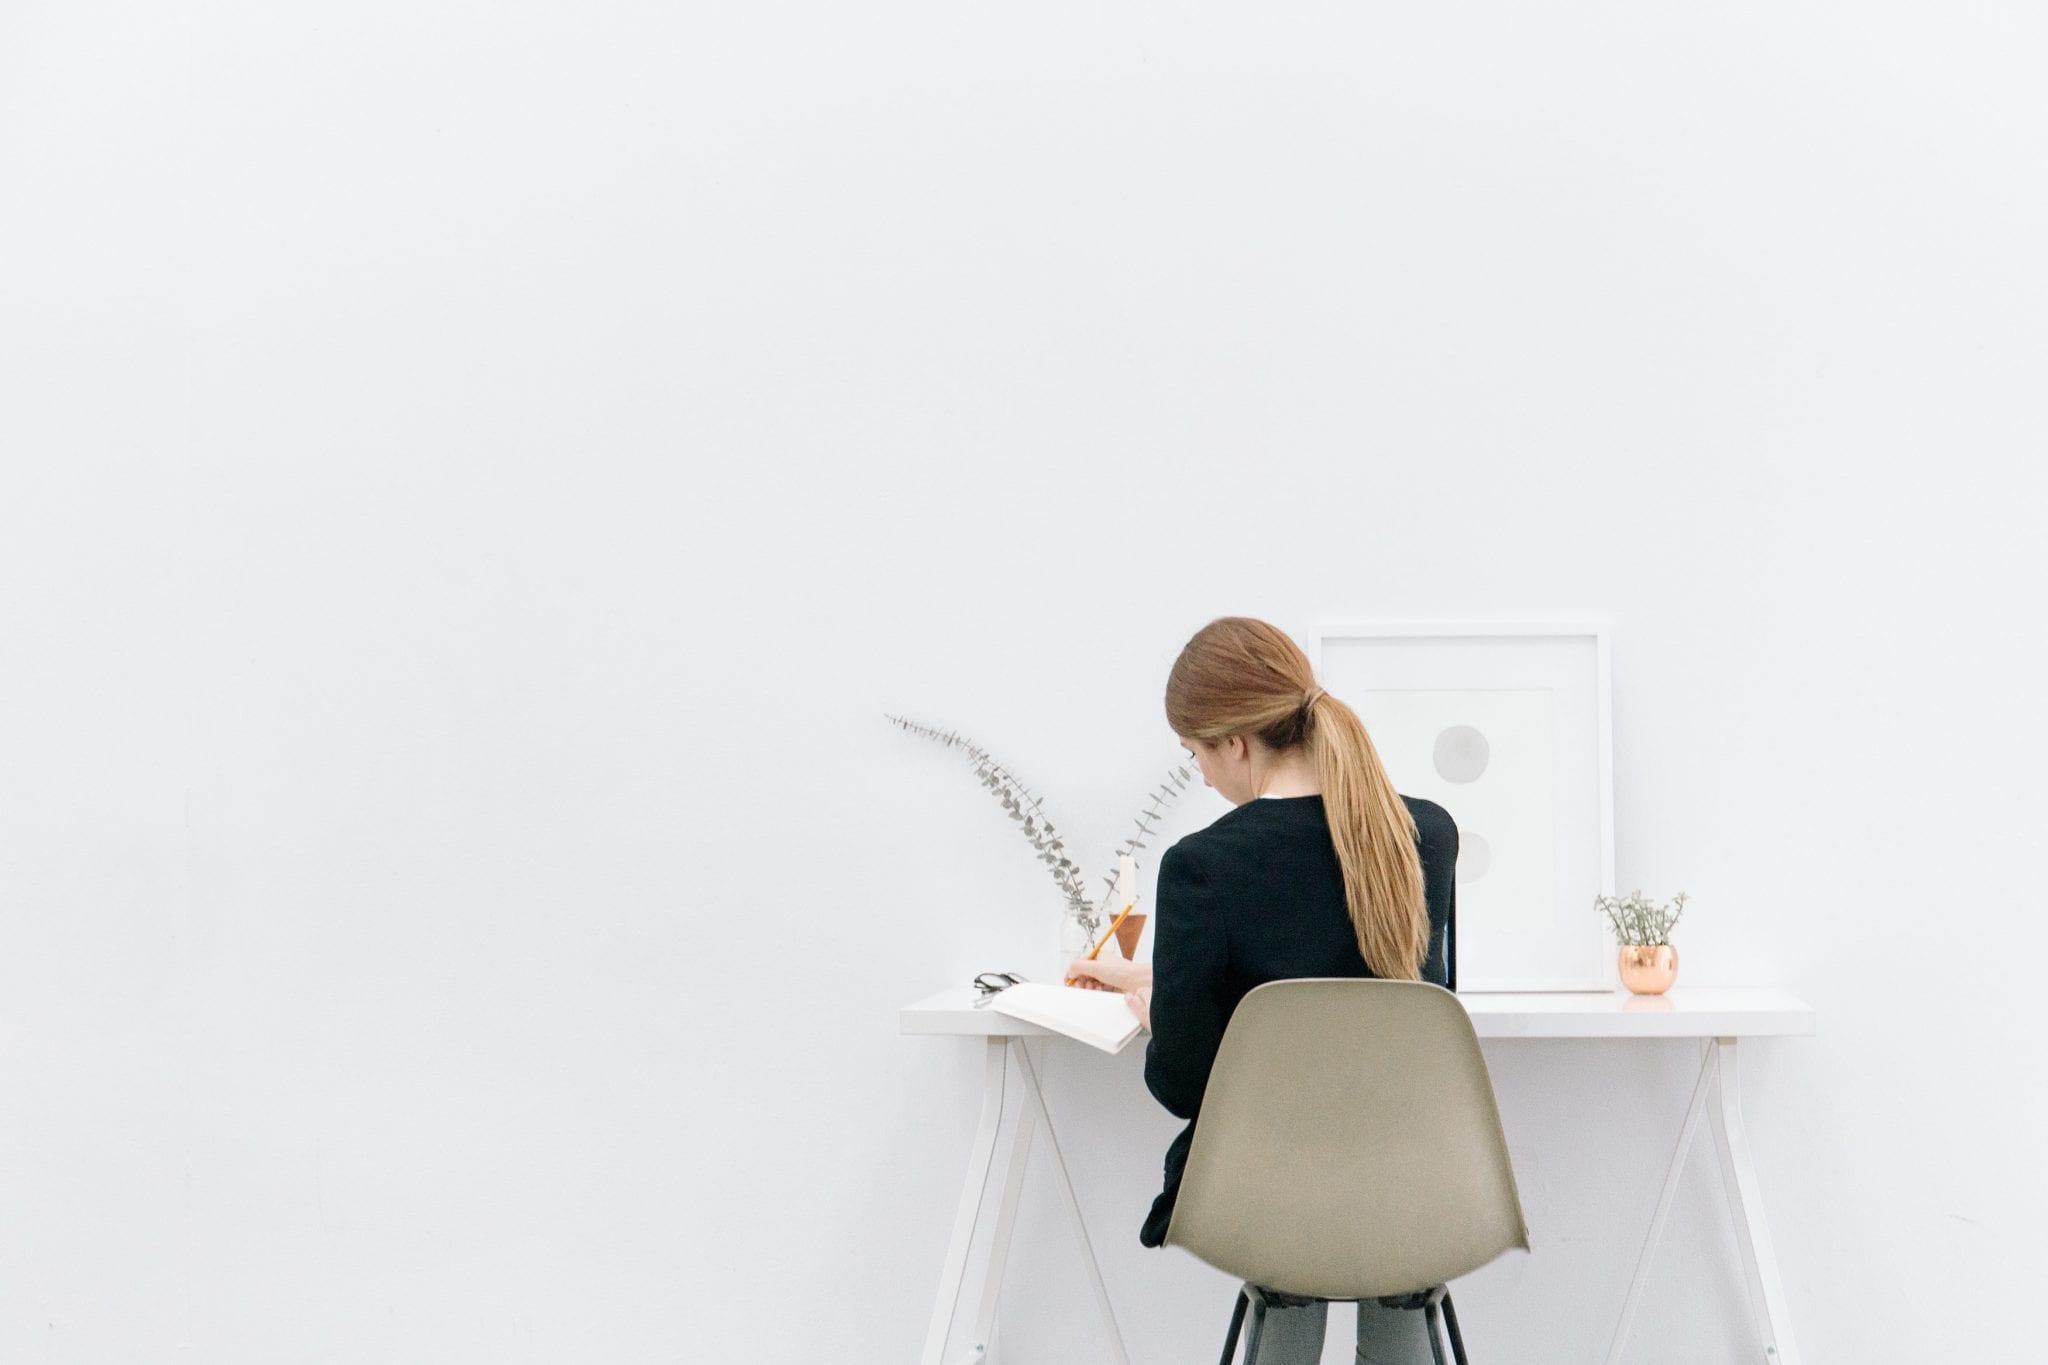 women_better_business_leaders